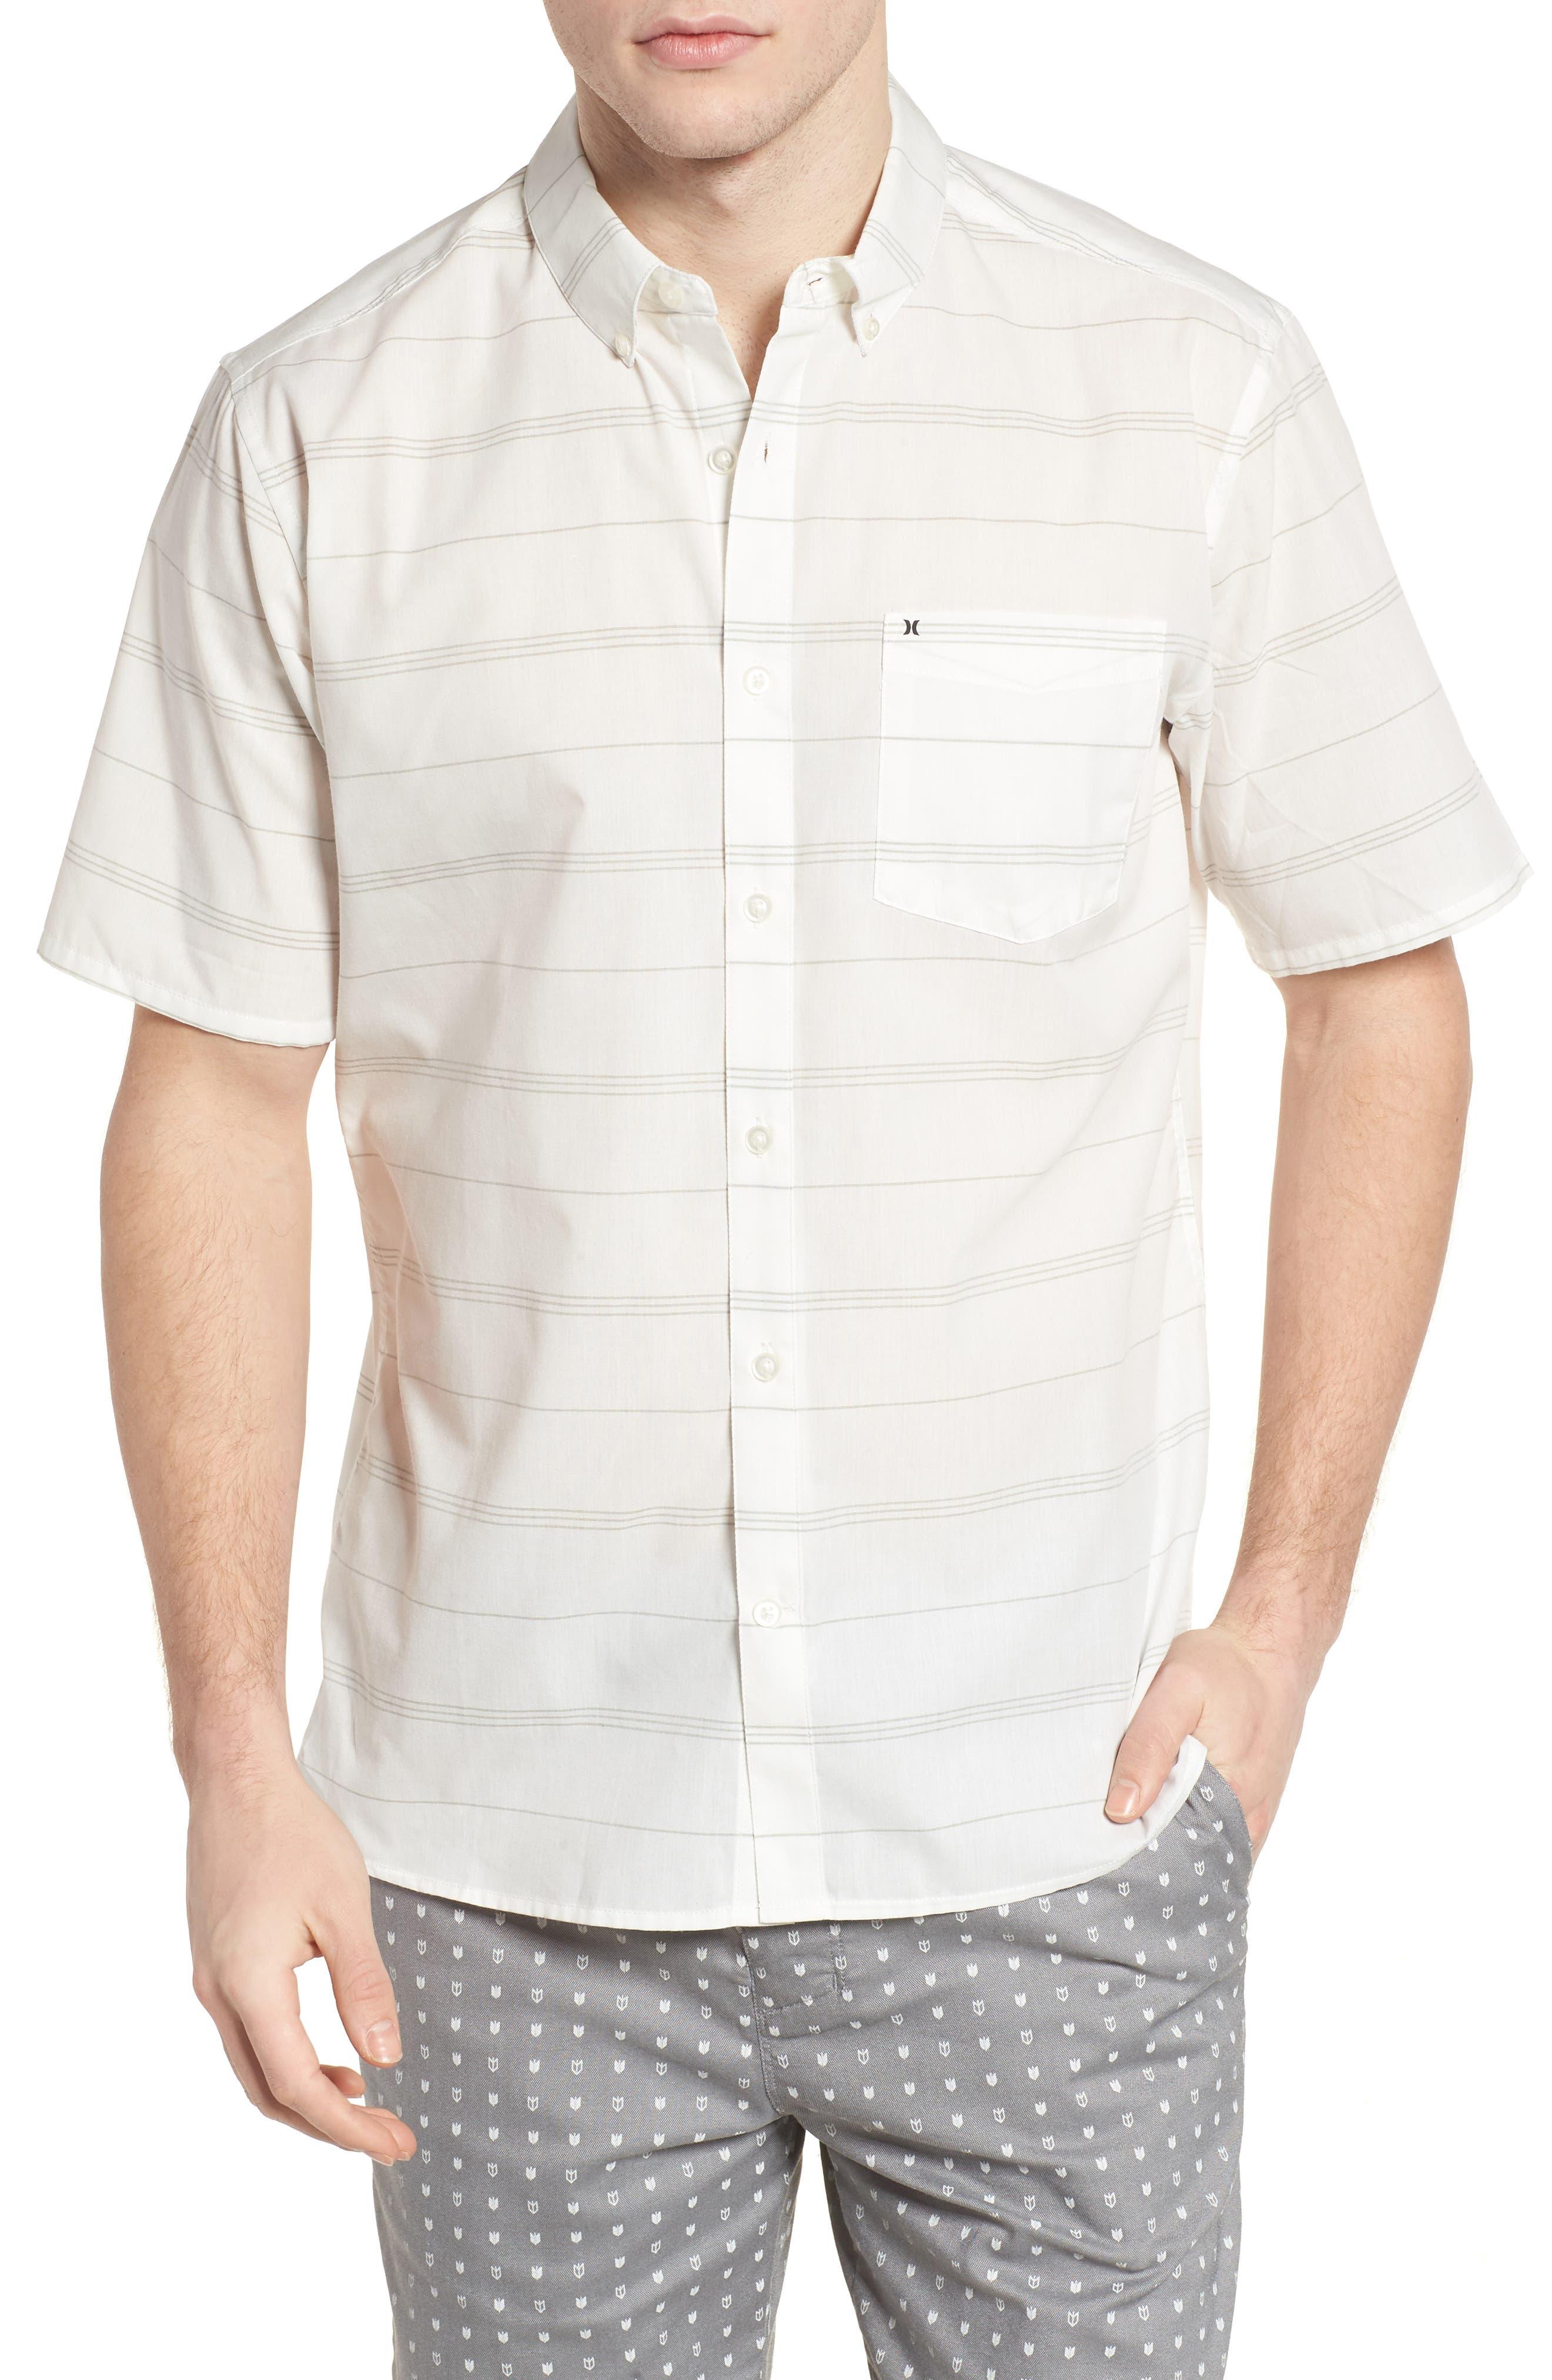 Dri-FIT Rhythm Shirt,                             Main thumbnail 1, color,                             Sail